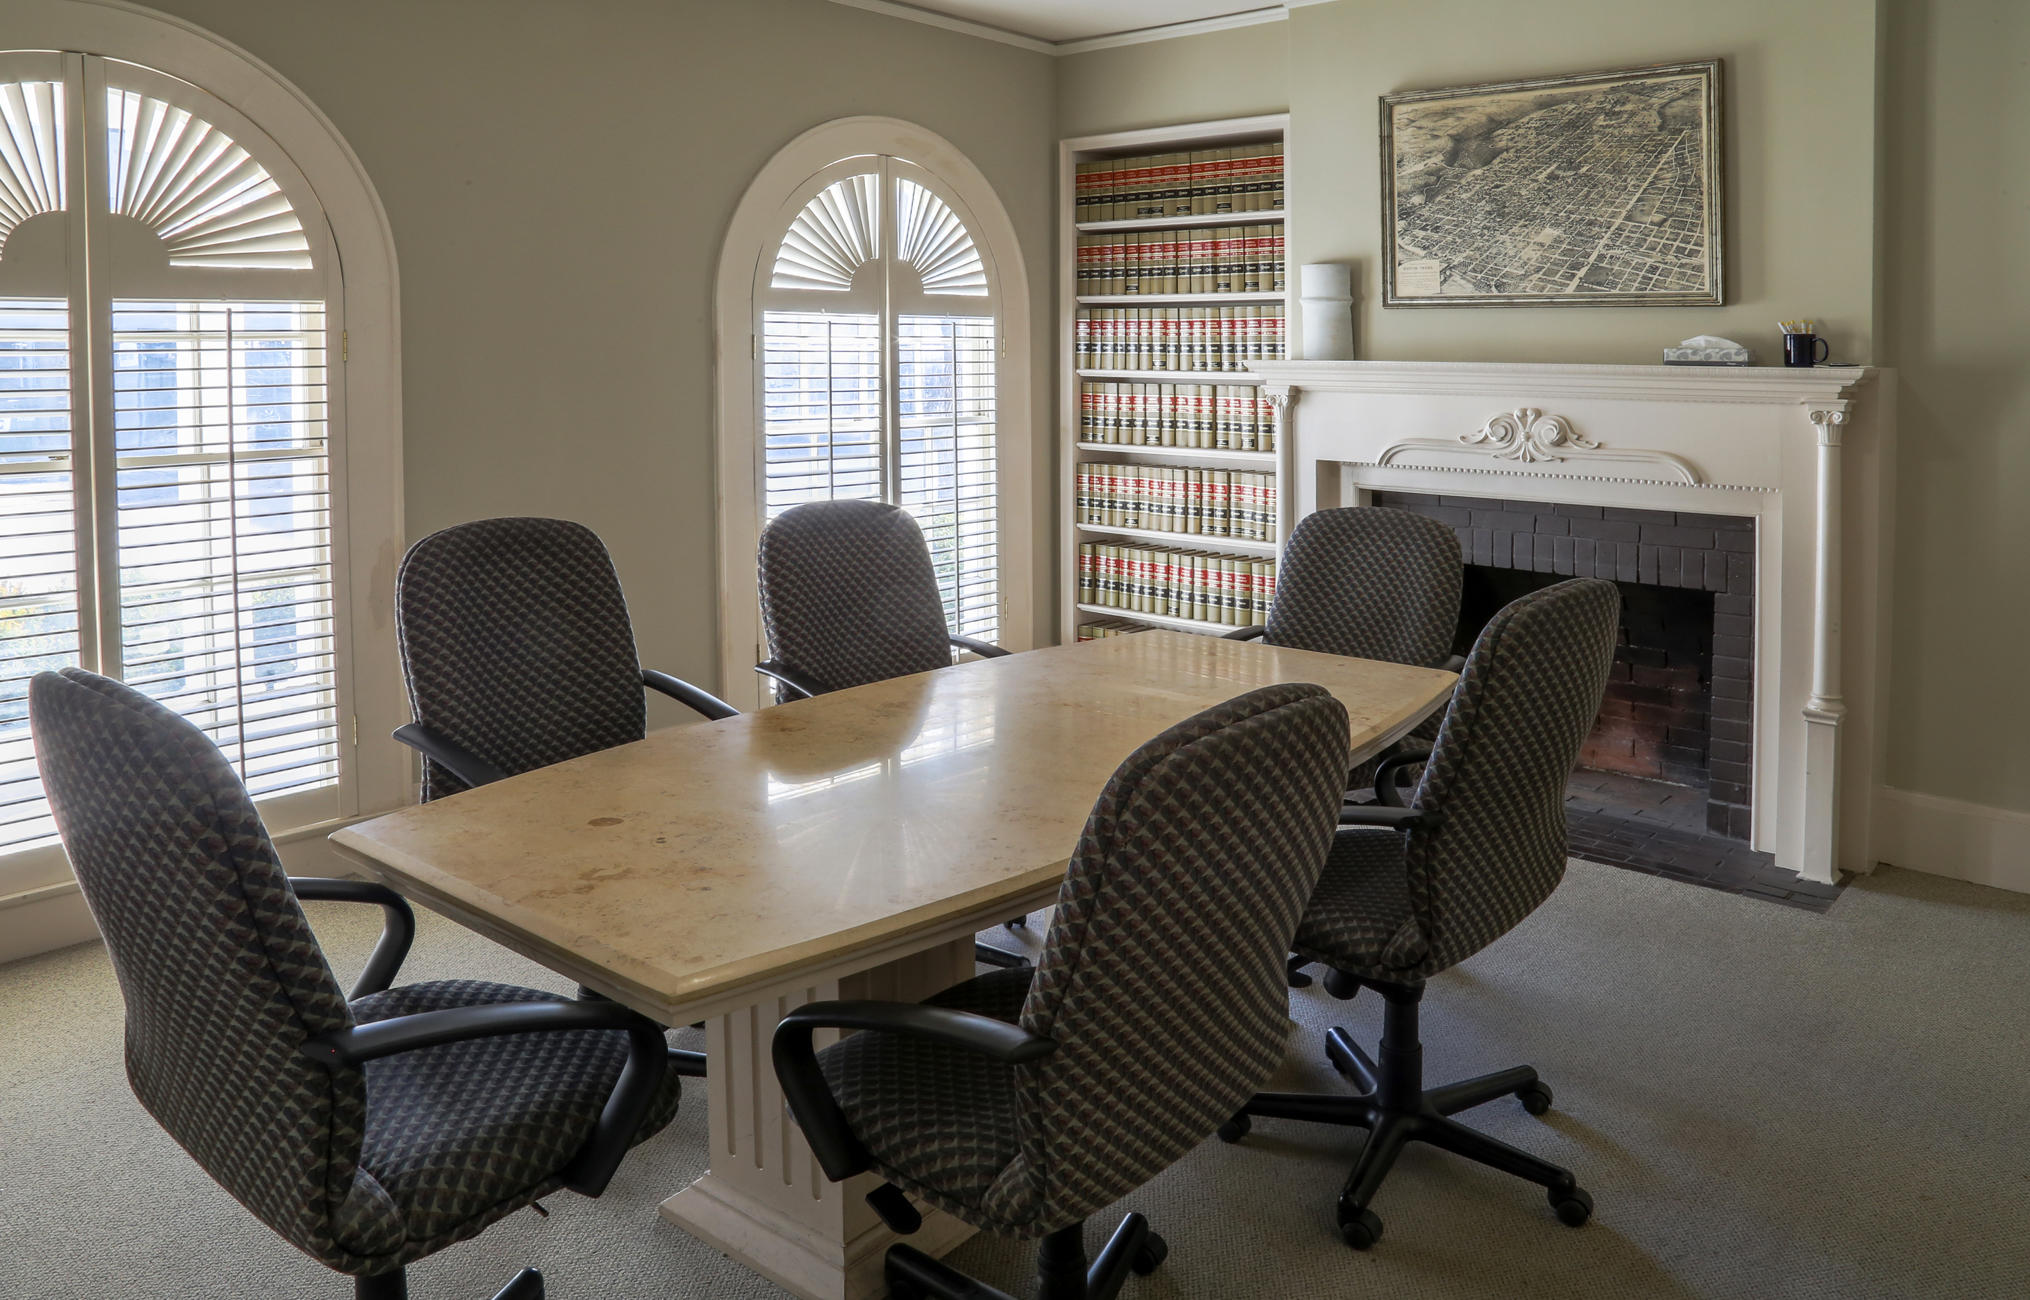 Dunham & Jones, Austin DWI Attorneys image 2